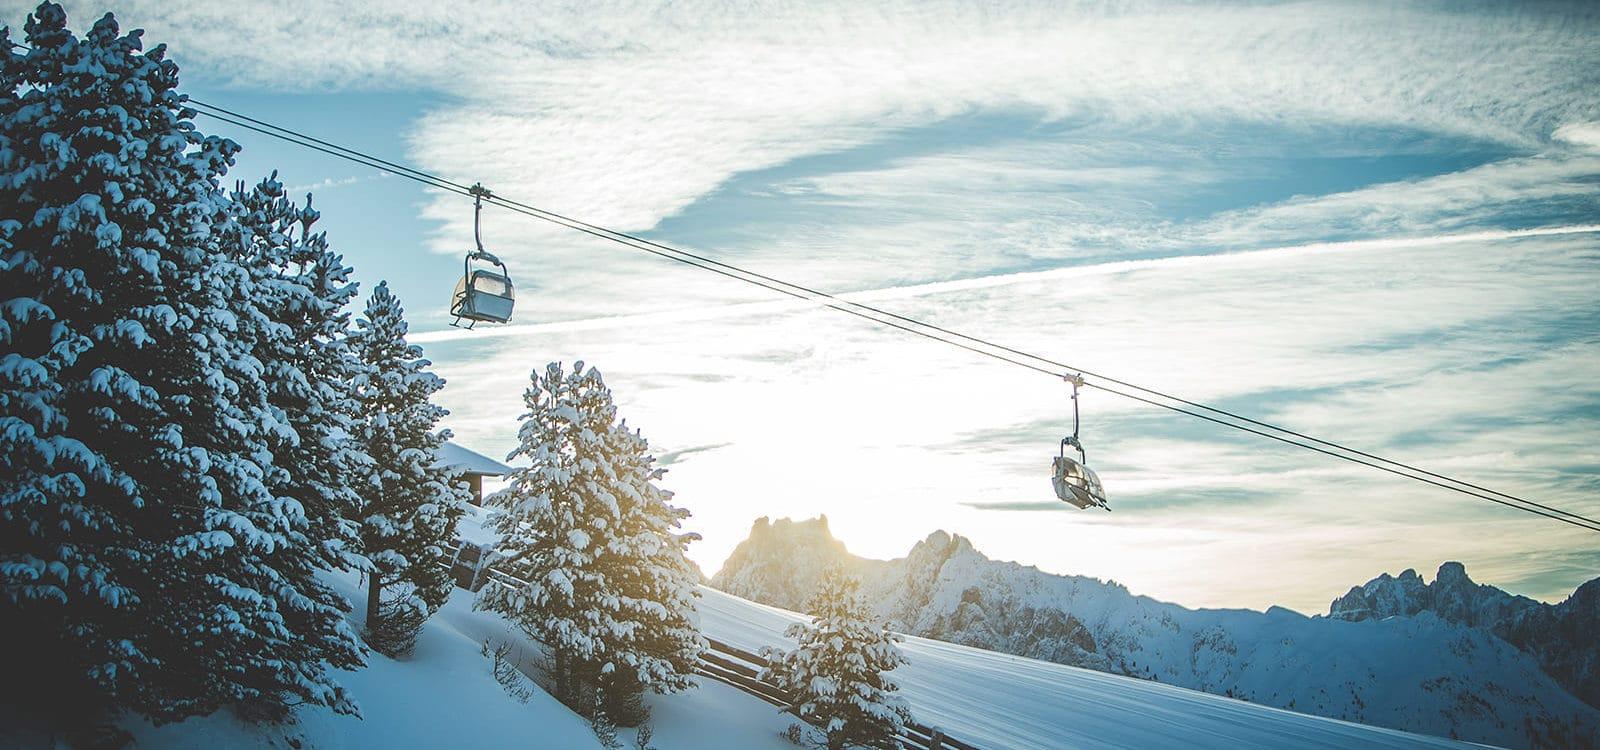 Gerharts - 10% ab 7 Tagen im Winter in Brixen